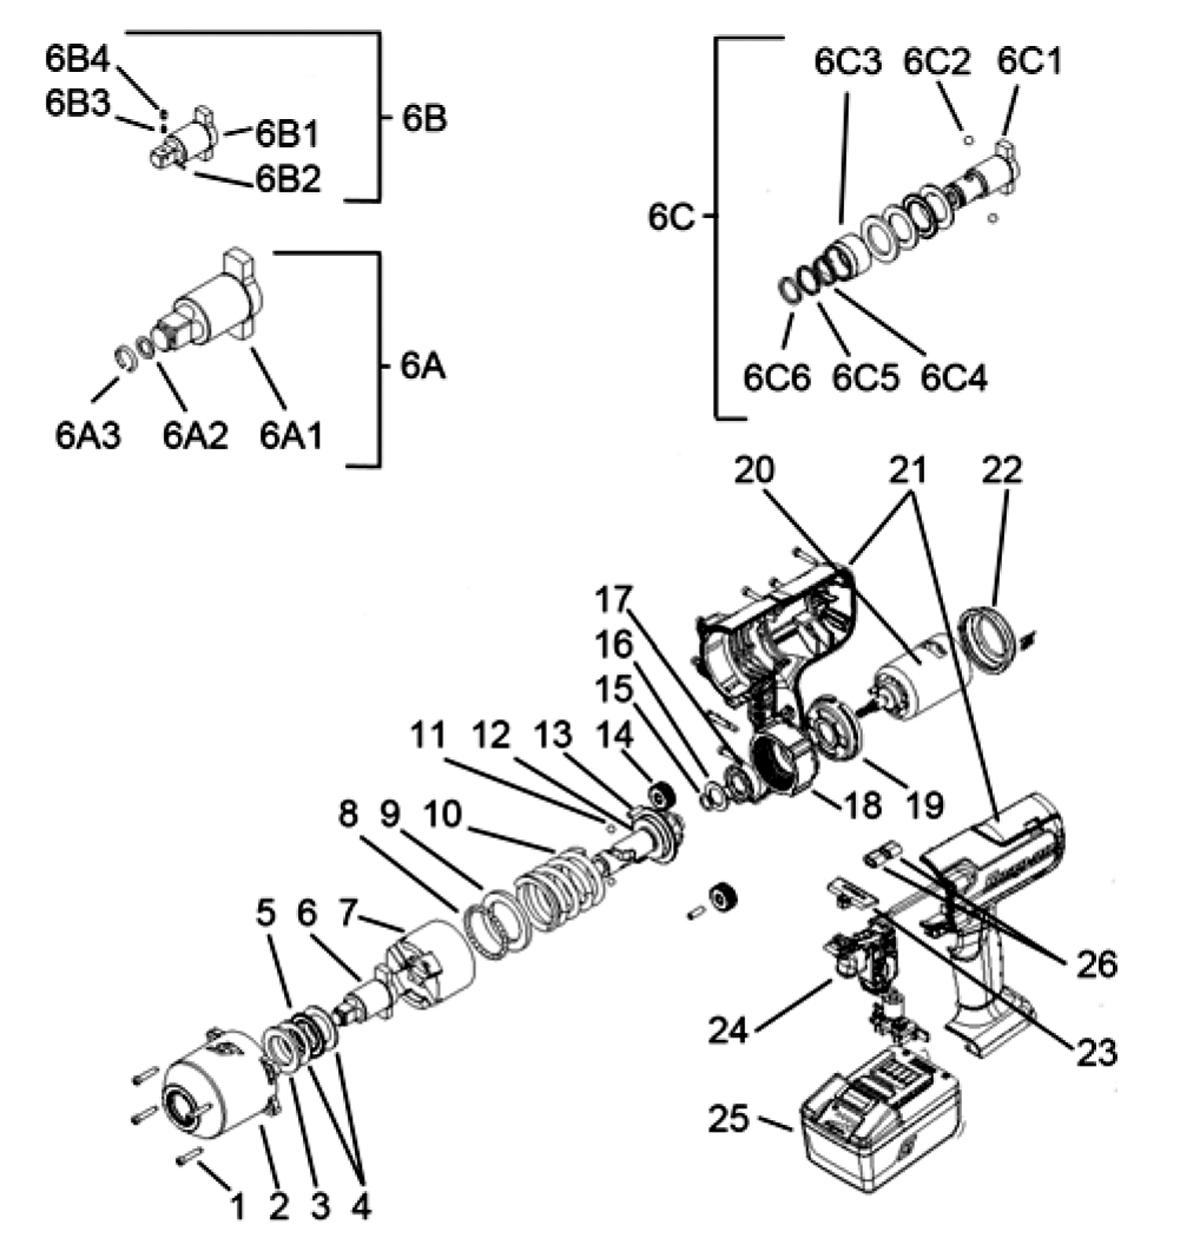 Impact Wrench, Cordless, Lithium, 18 Volt, 1/2